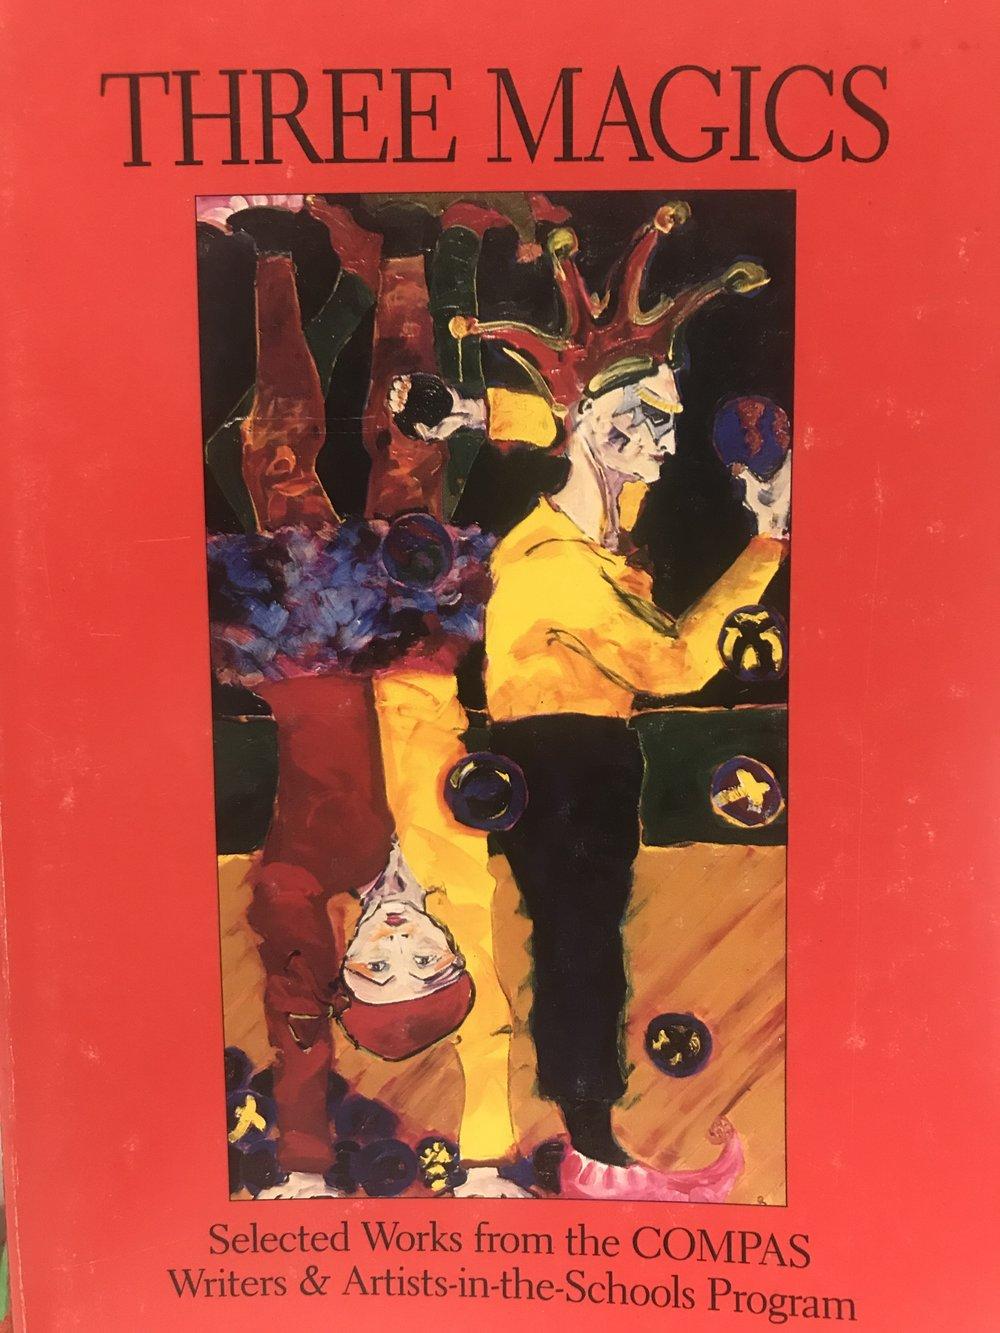 COMPAS' 1987 student anthology  Three Magics